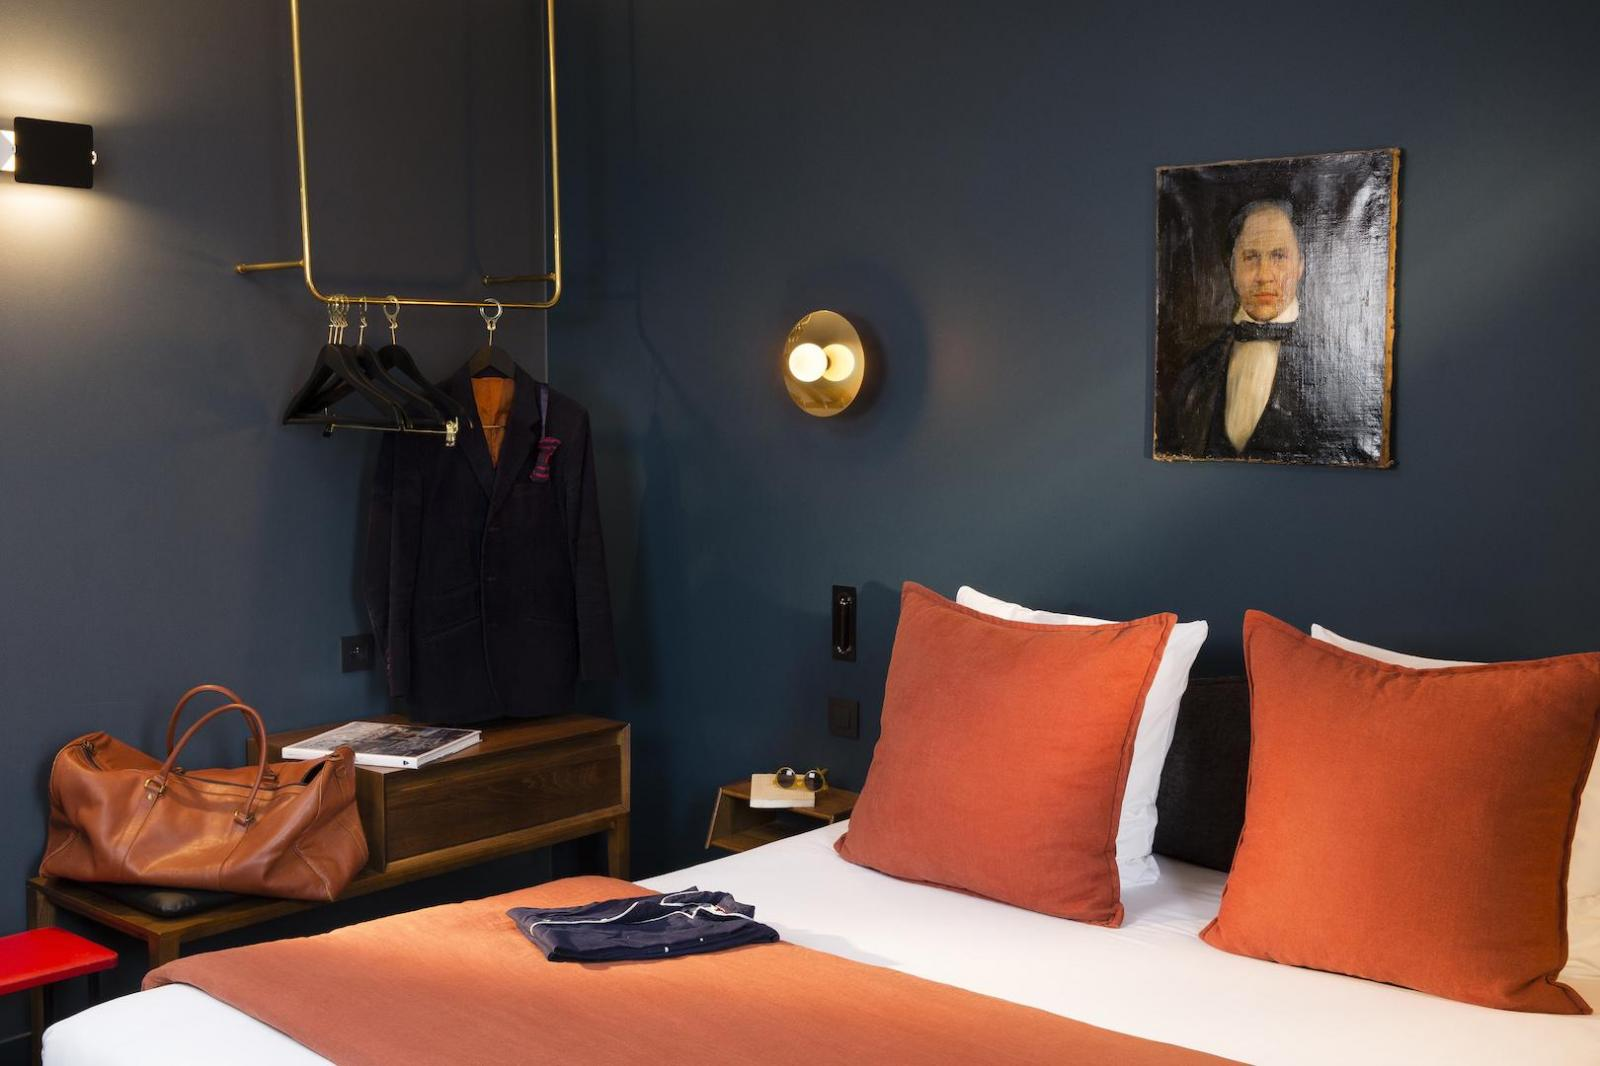 coq-hotel-galerie-photos-106346-1600-900-auto.jpeg